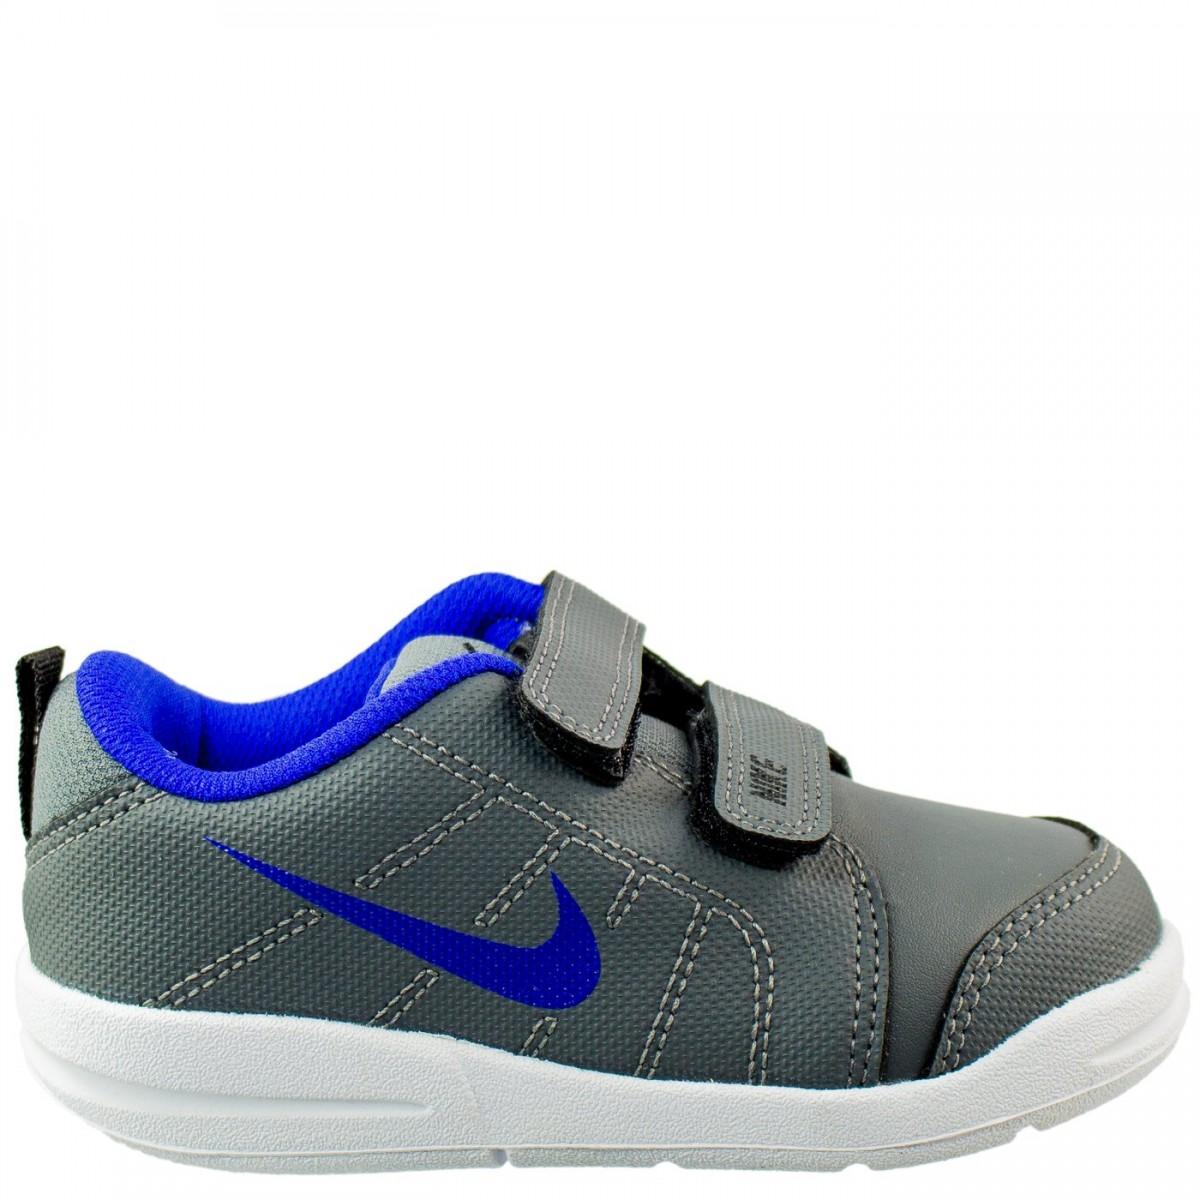 6205f94e319 Bizz Store - Tênis Masculino Nike Pico LT Infantil